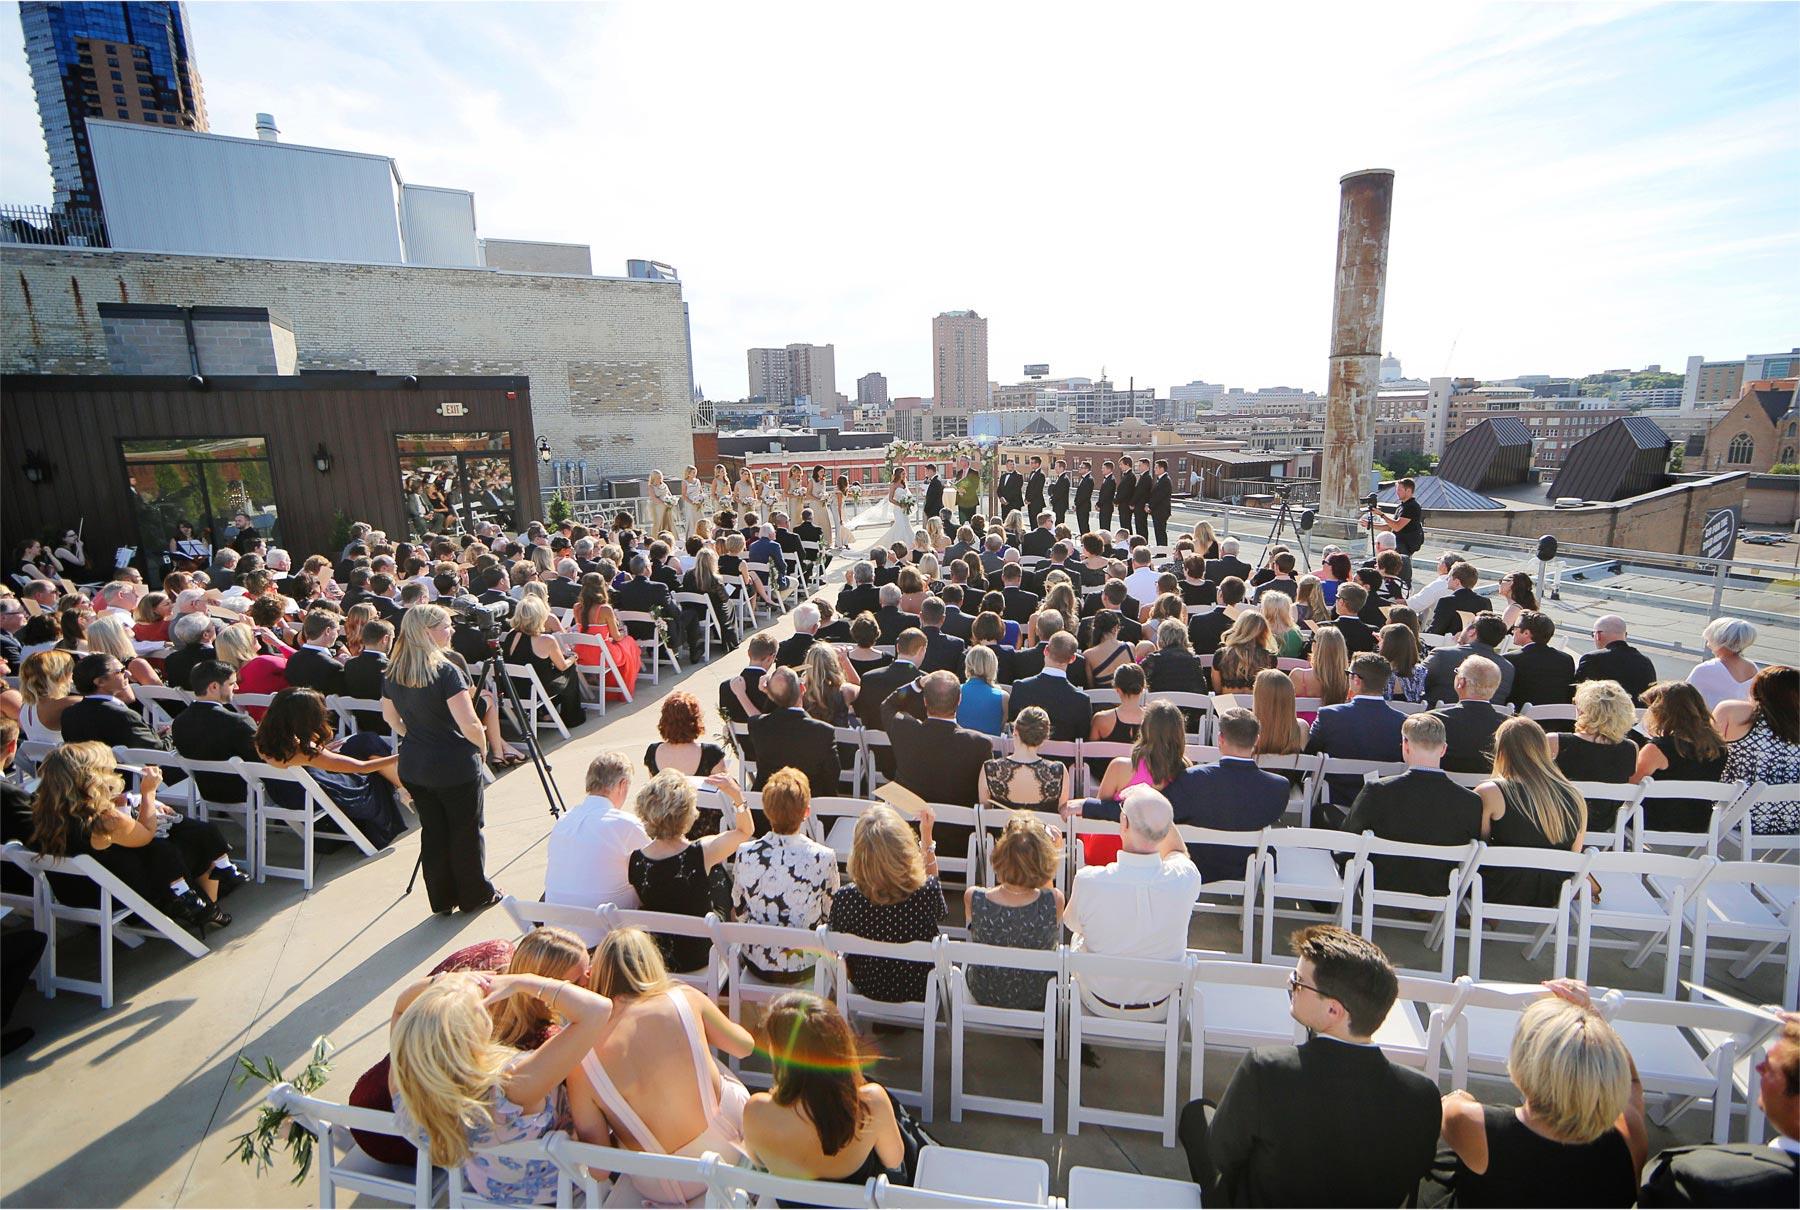 18-Saint-Paul-Minnesota-Wedding-Photographer-by-Andrew-Vick-Photography-Summer-Abulae-Ceremony-Bride-Groom-Bridesmaids-Groomsmen-Bridal-Party-Molly-and-Dan.jpg